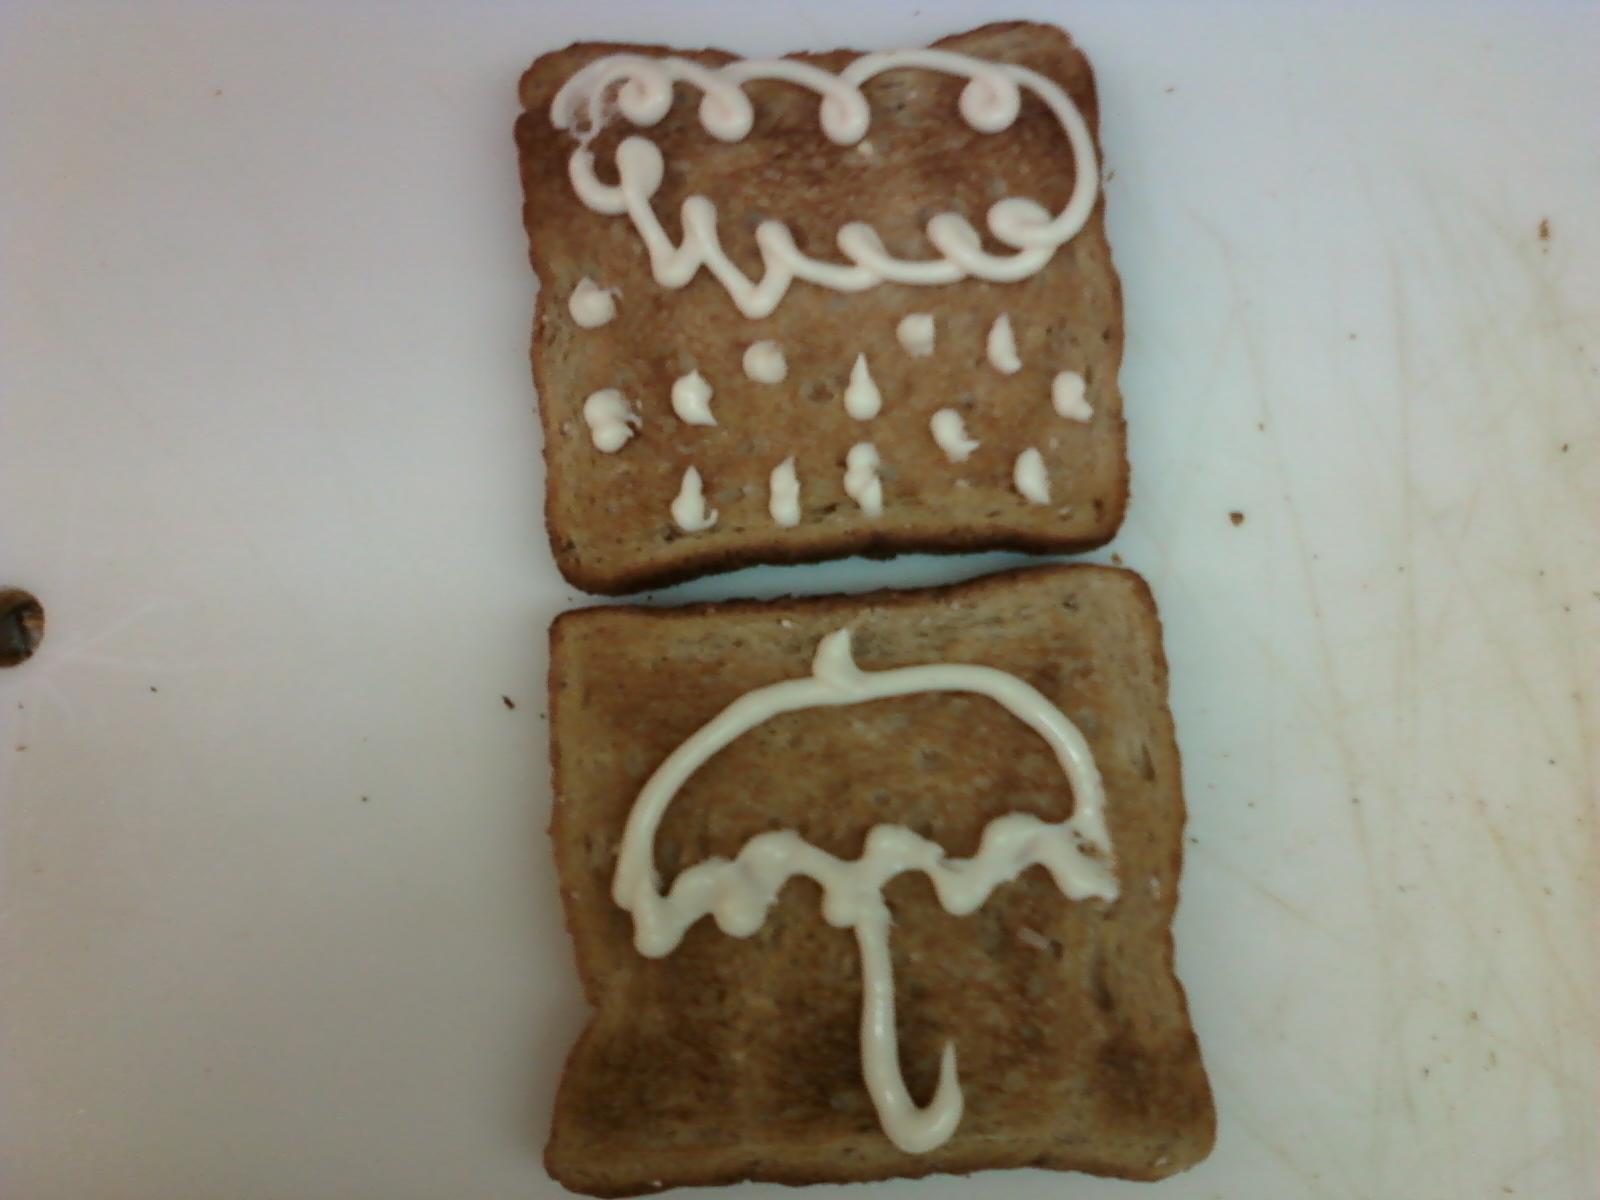 sandwich_art/0909111014.jpg